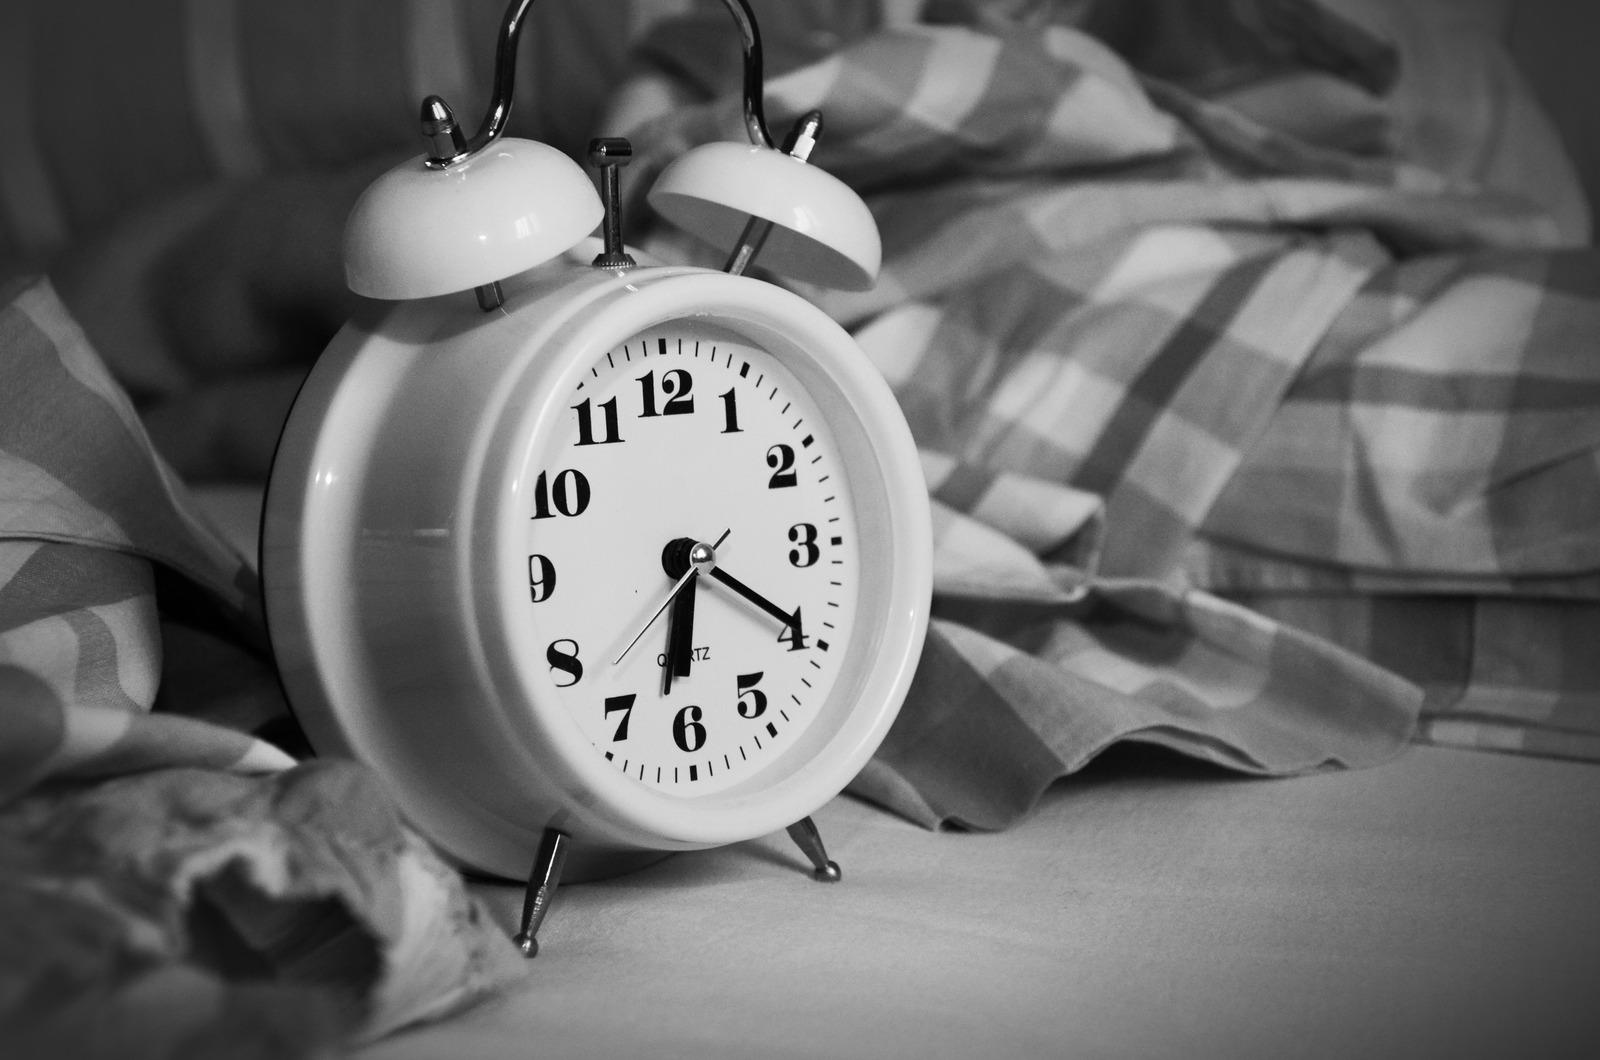 snoring - turoparkmedical